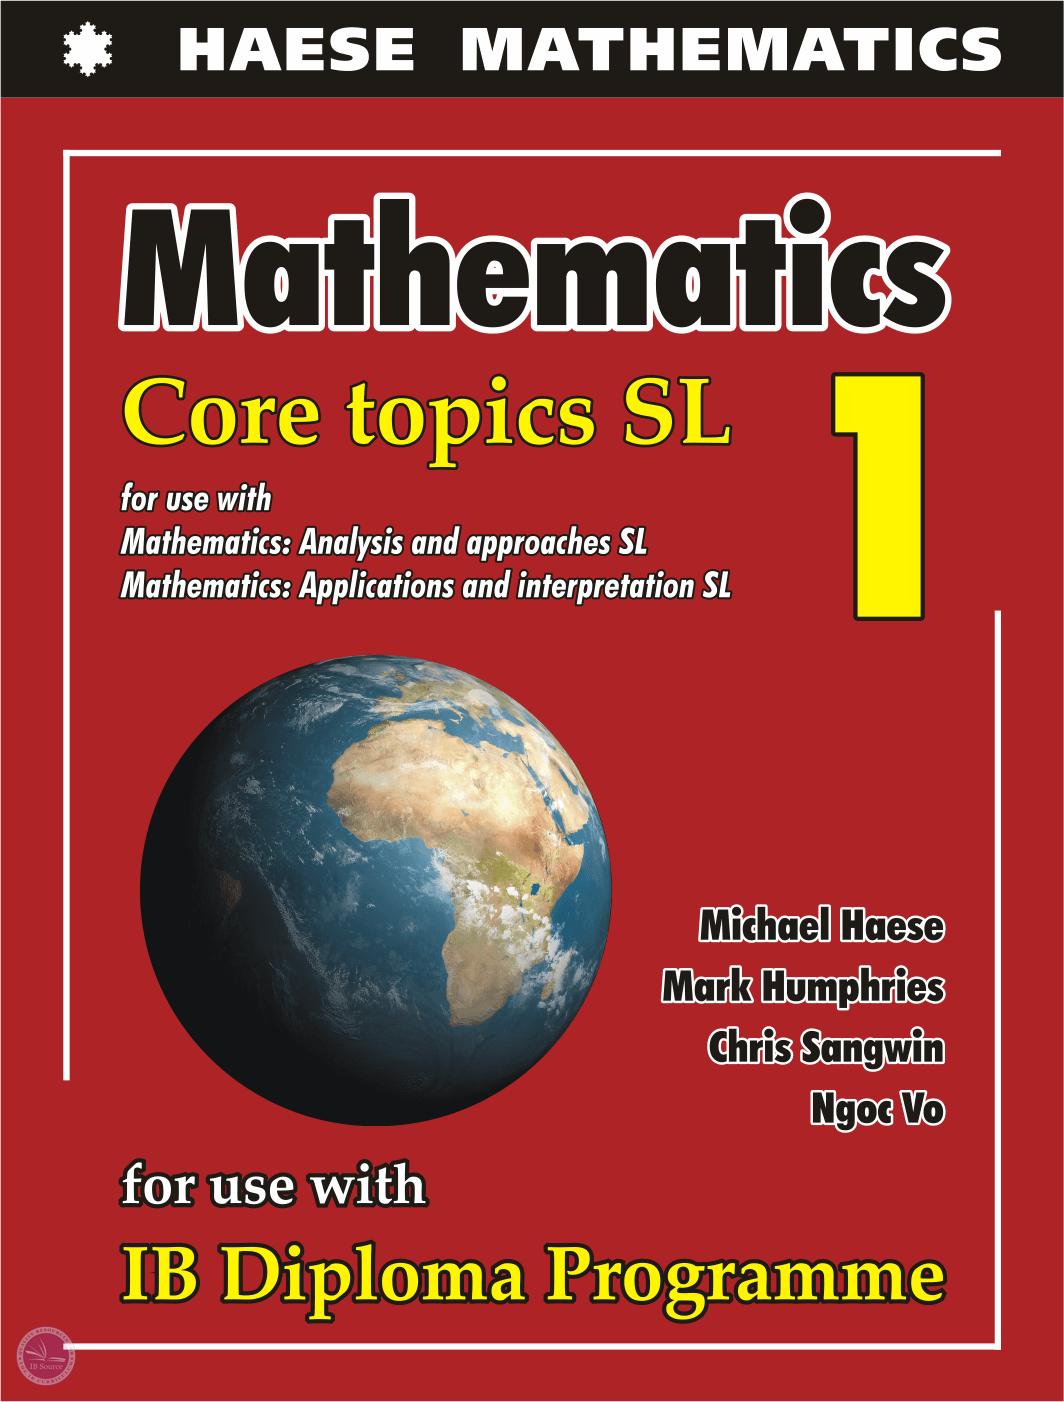 IB Mathematics Core Topics SL - Textbook (NYP Due July 2019